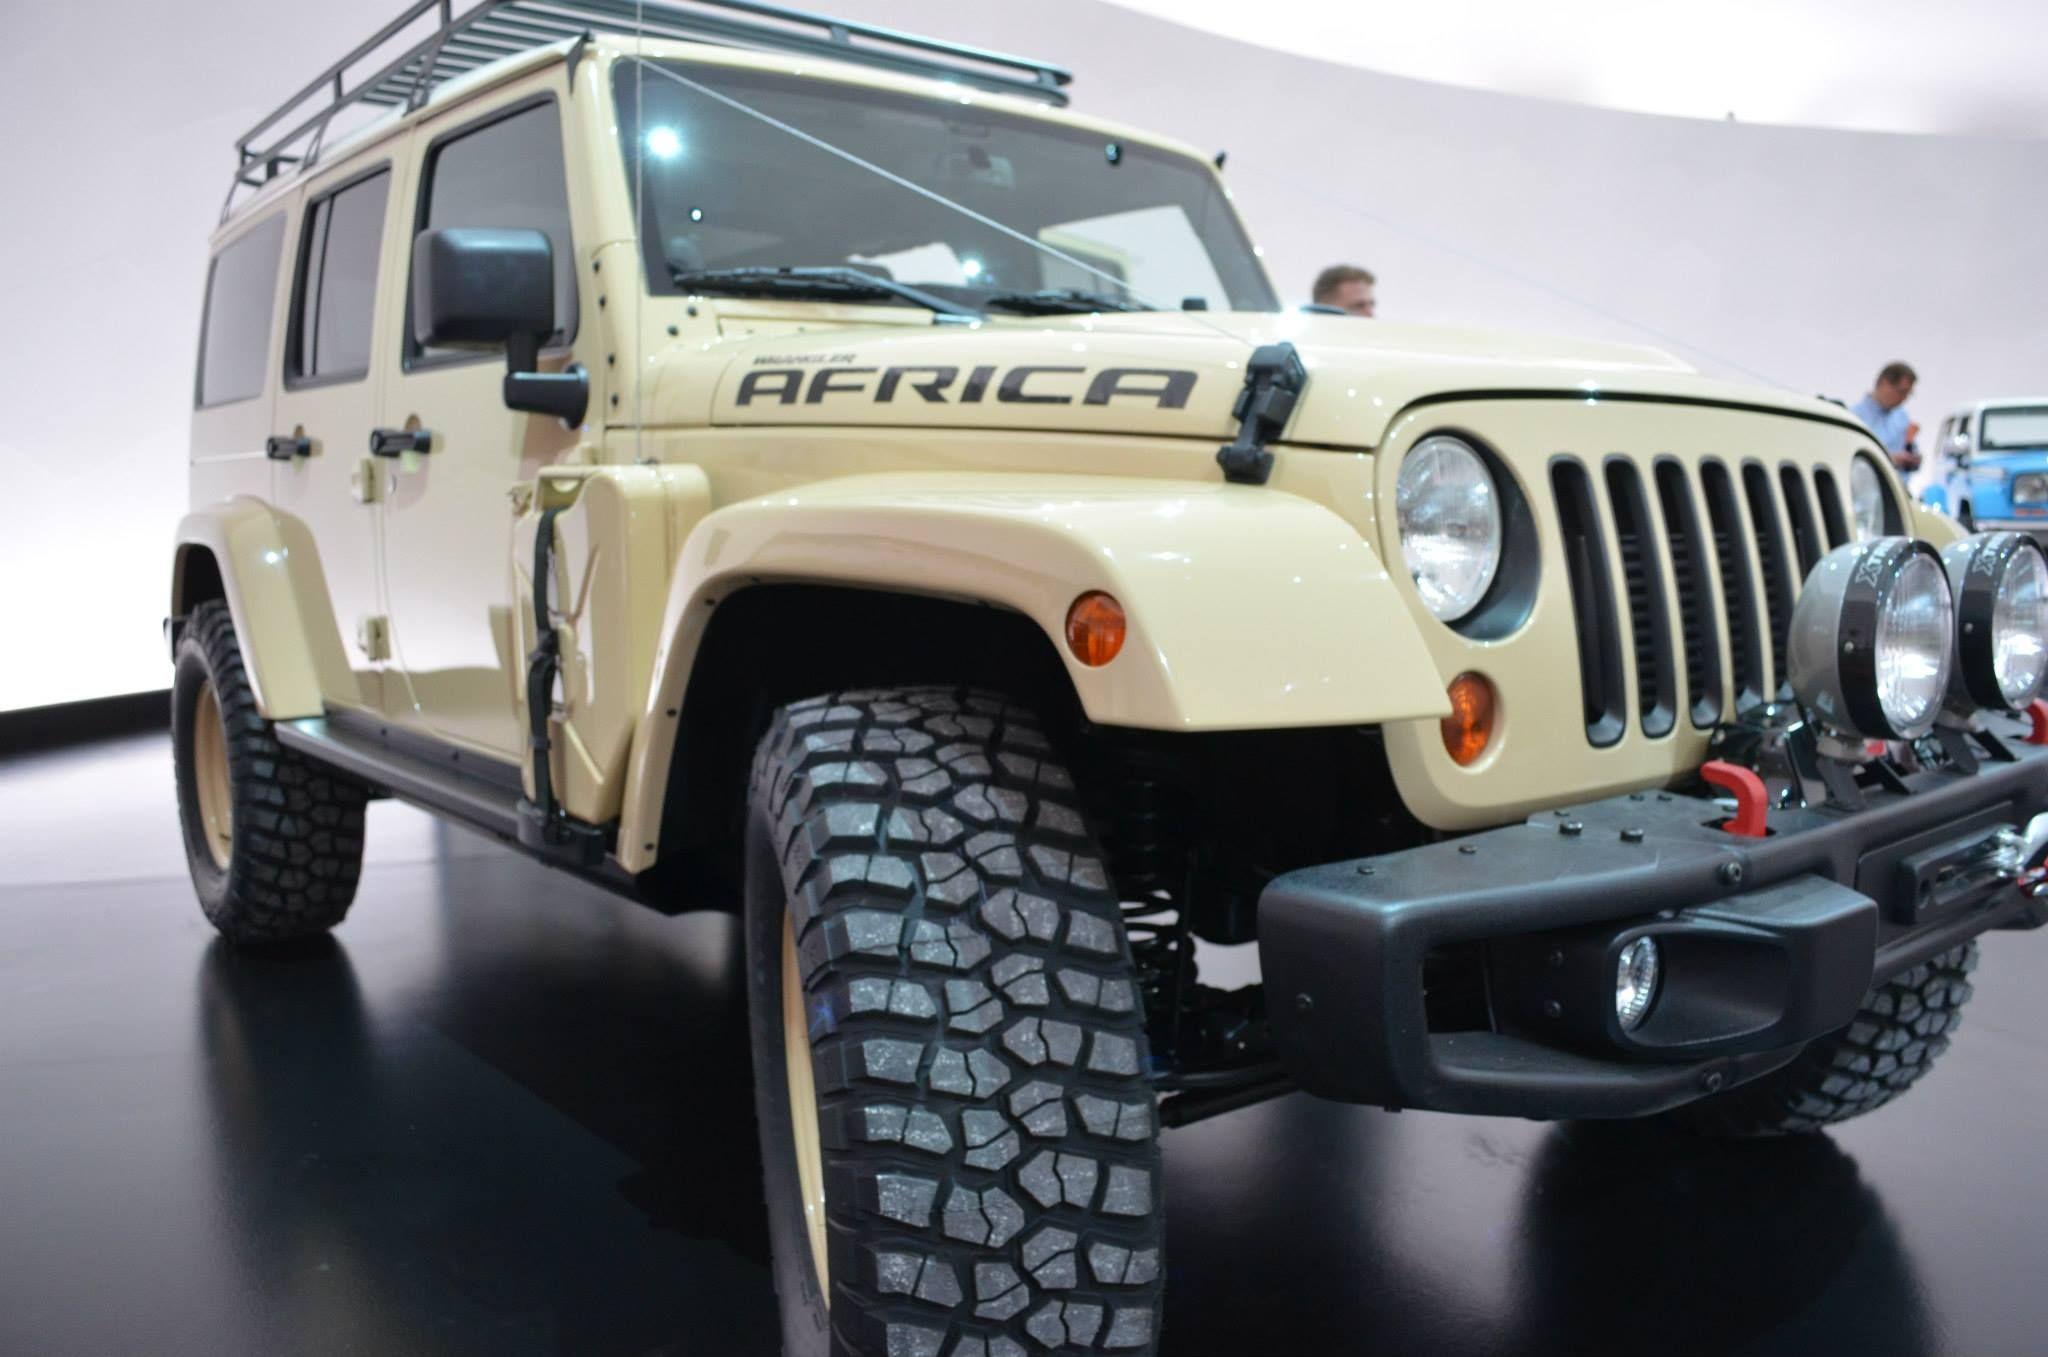 Jeep Wrangler Africa! Easter Jeep Safari in Moab Utah, 2015.